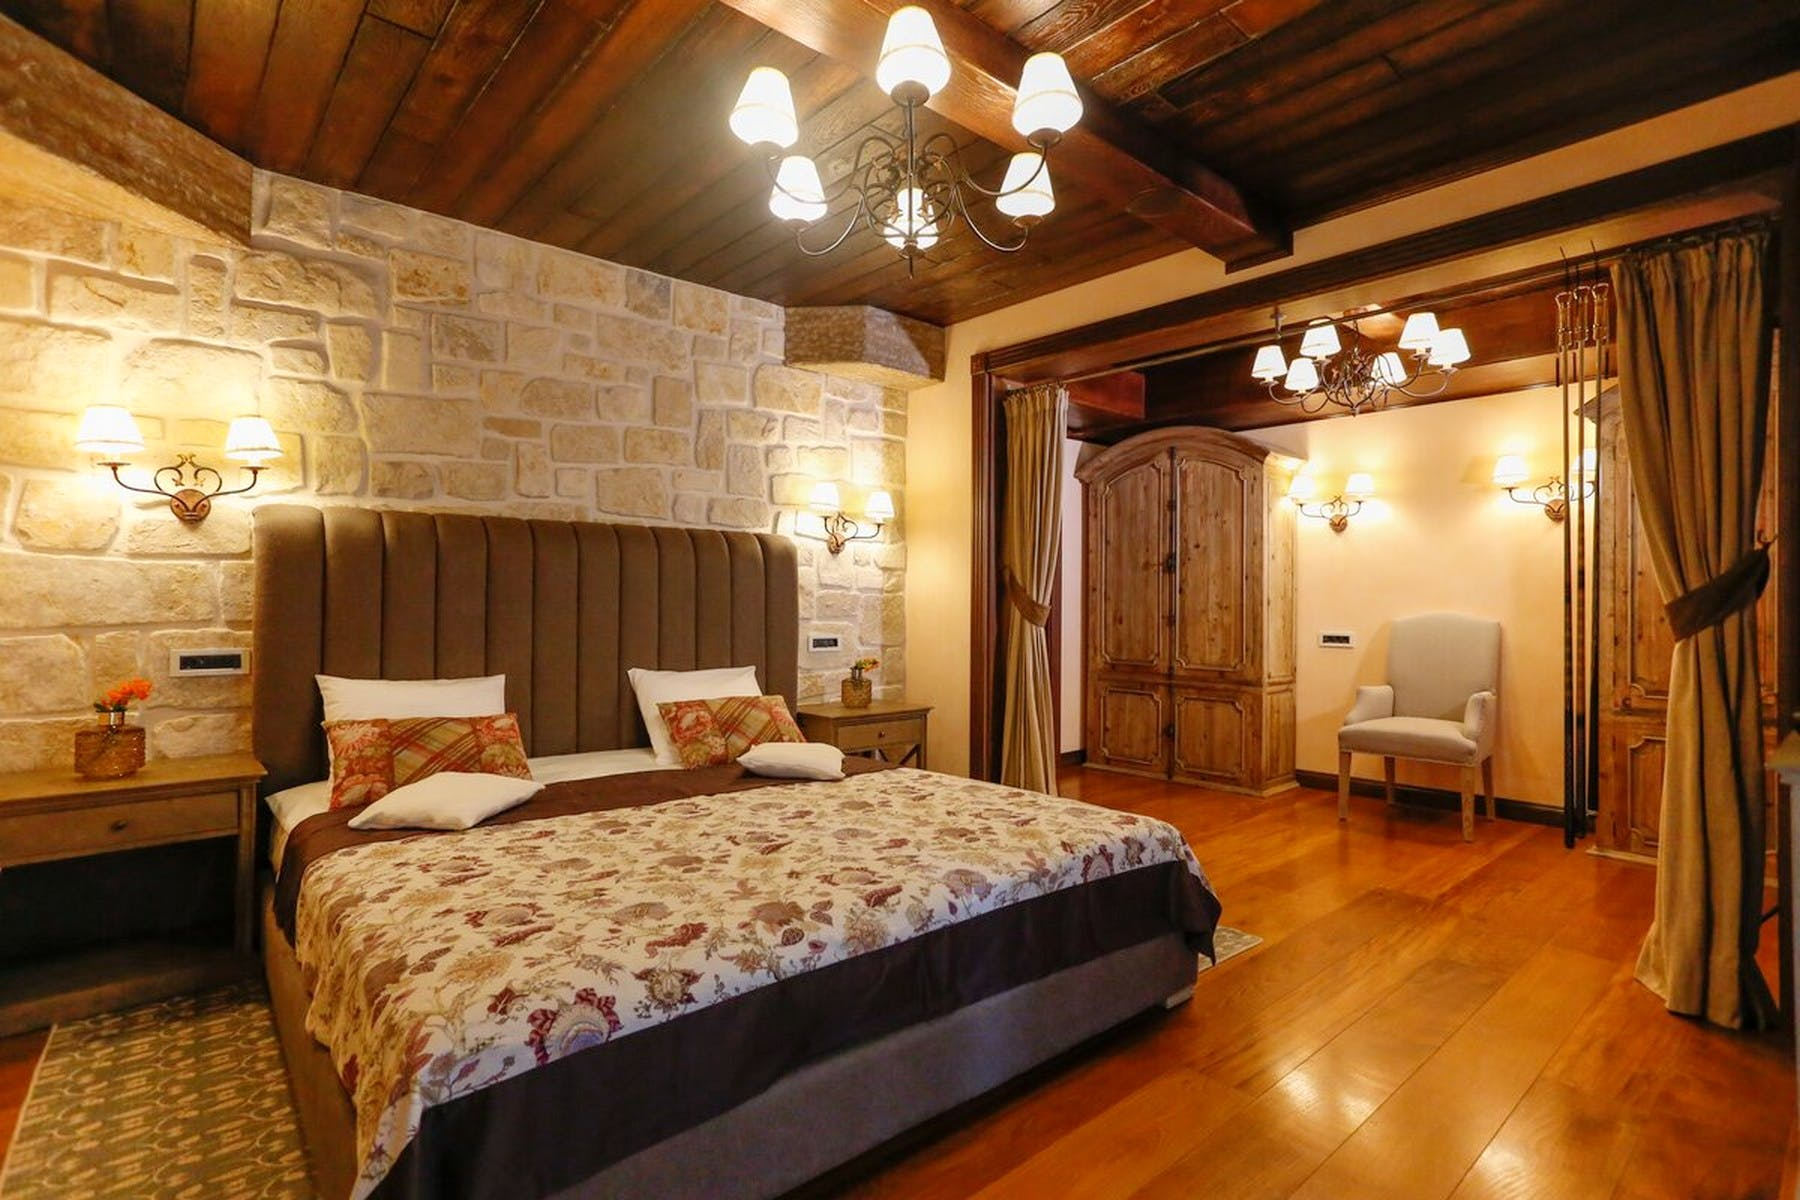 Spacious bedroom in warm colors